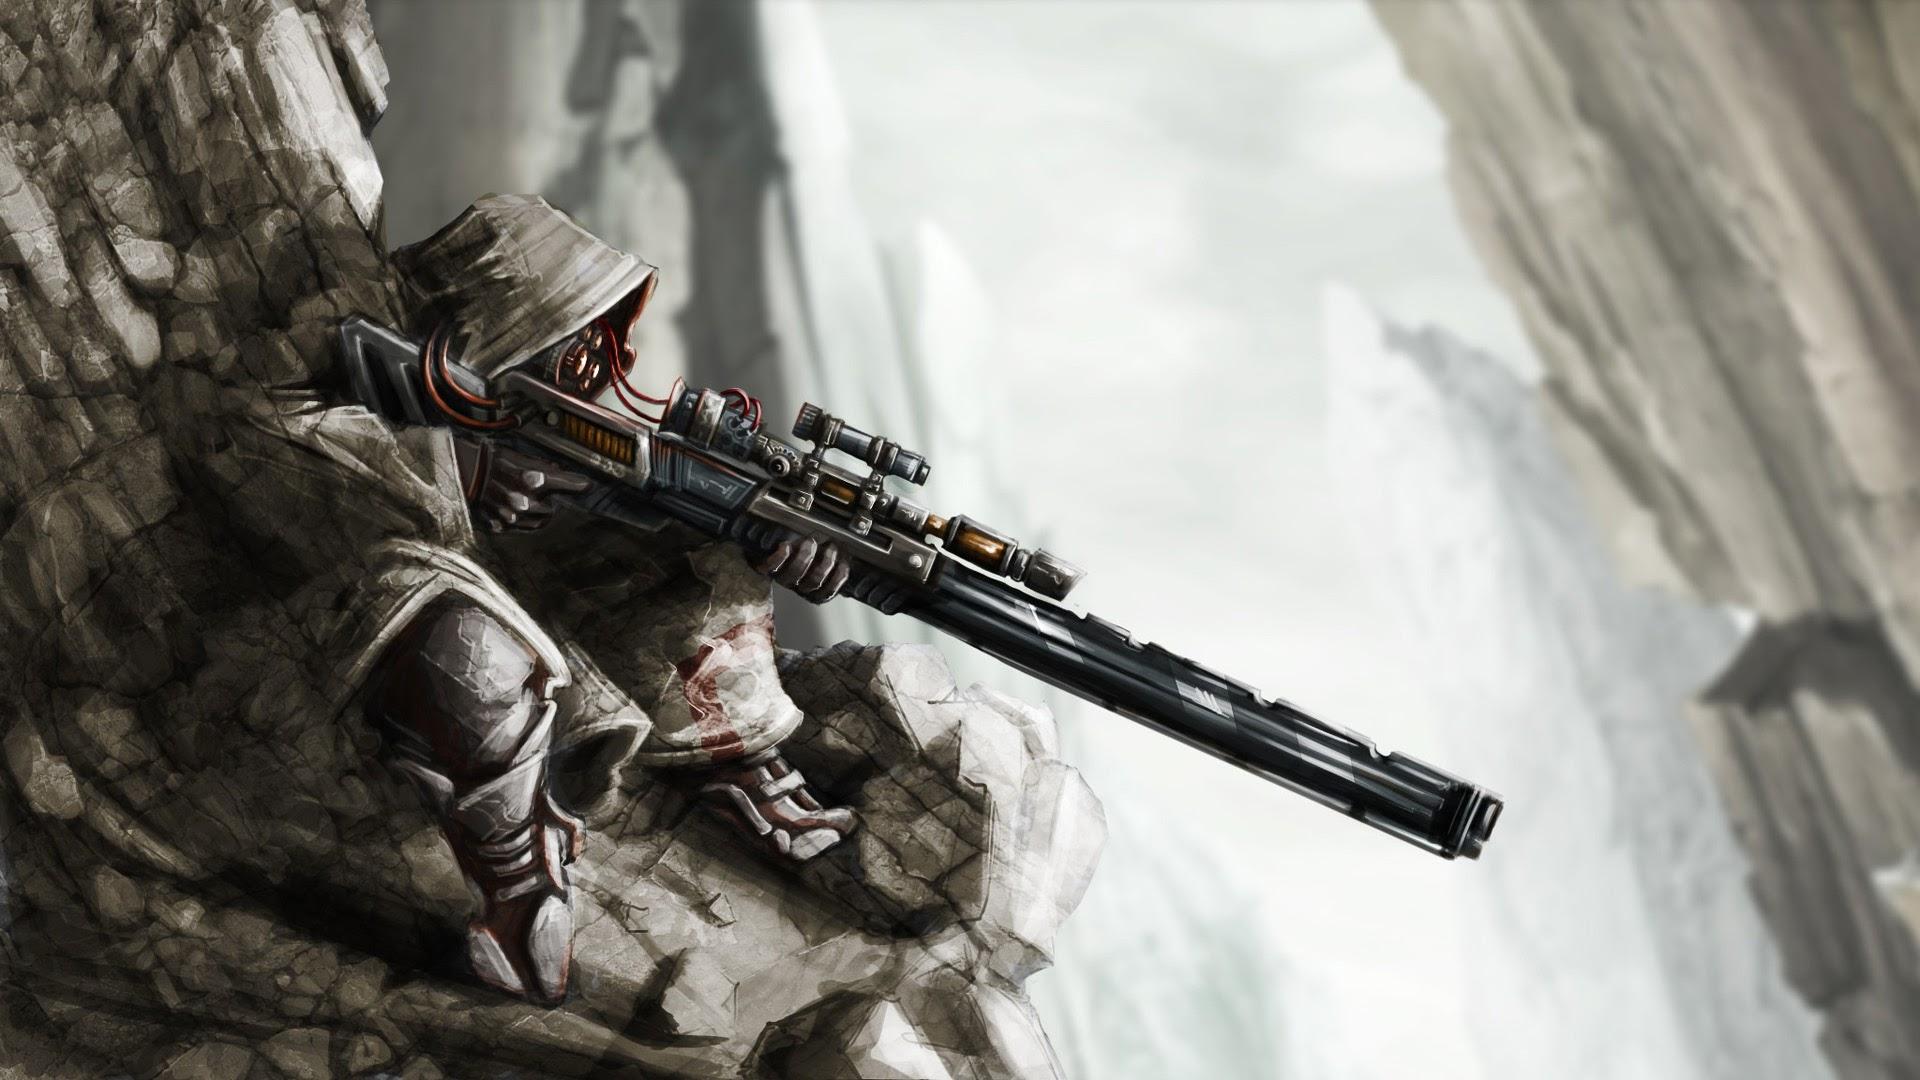 sniper marks man rifle fantasy hd wallpaper 1920x1080 a535 1920x1080